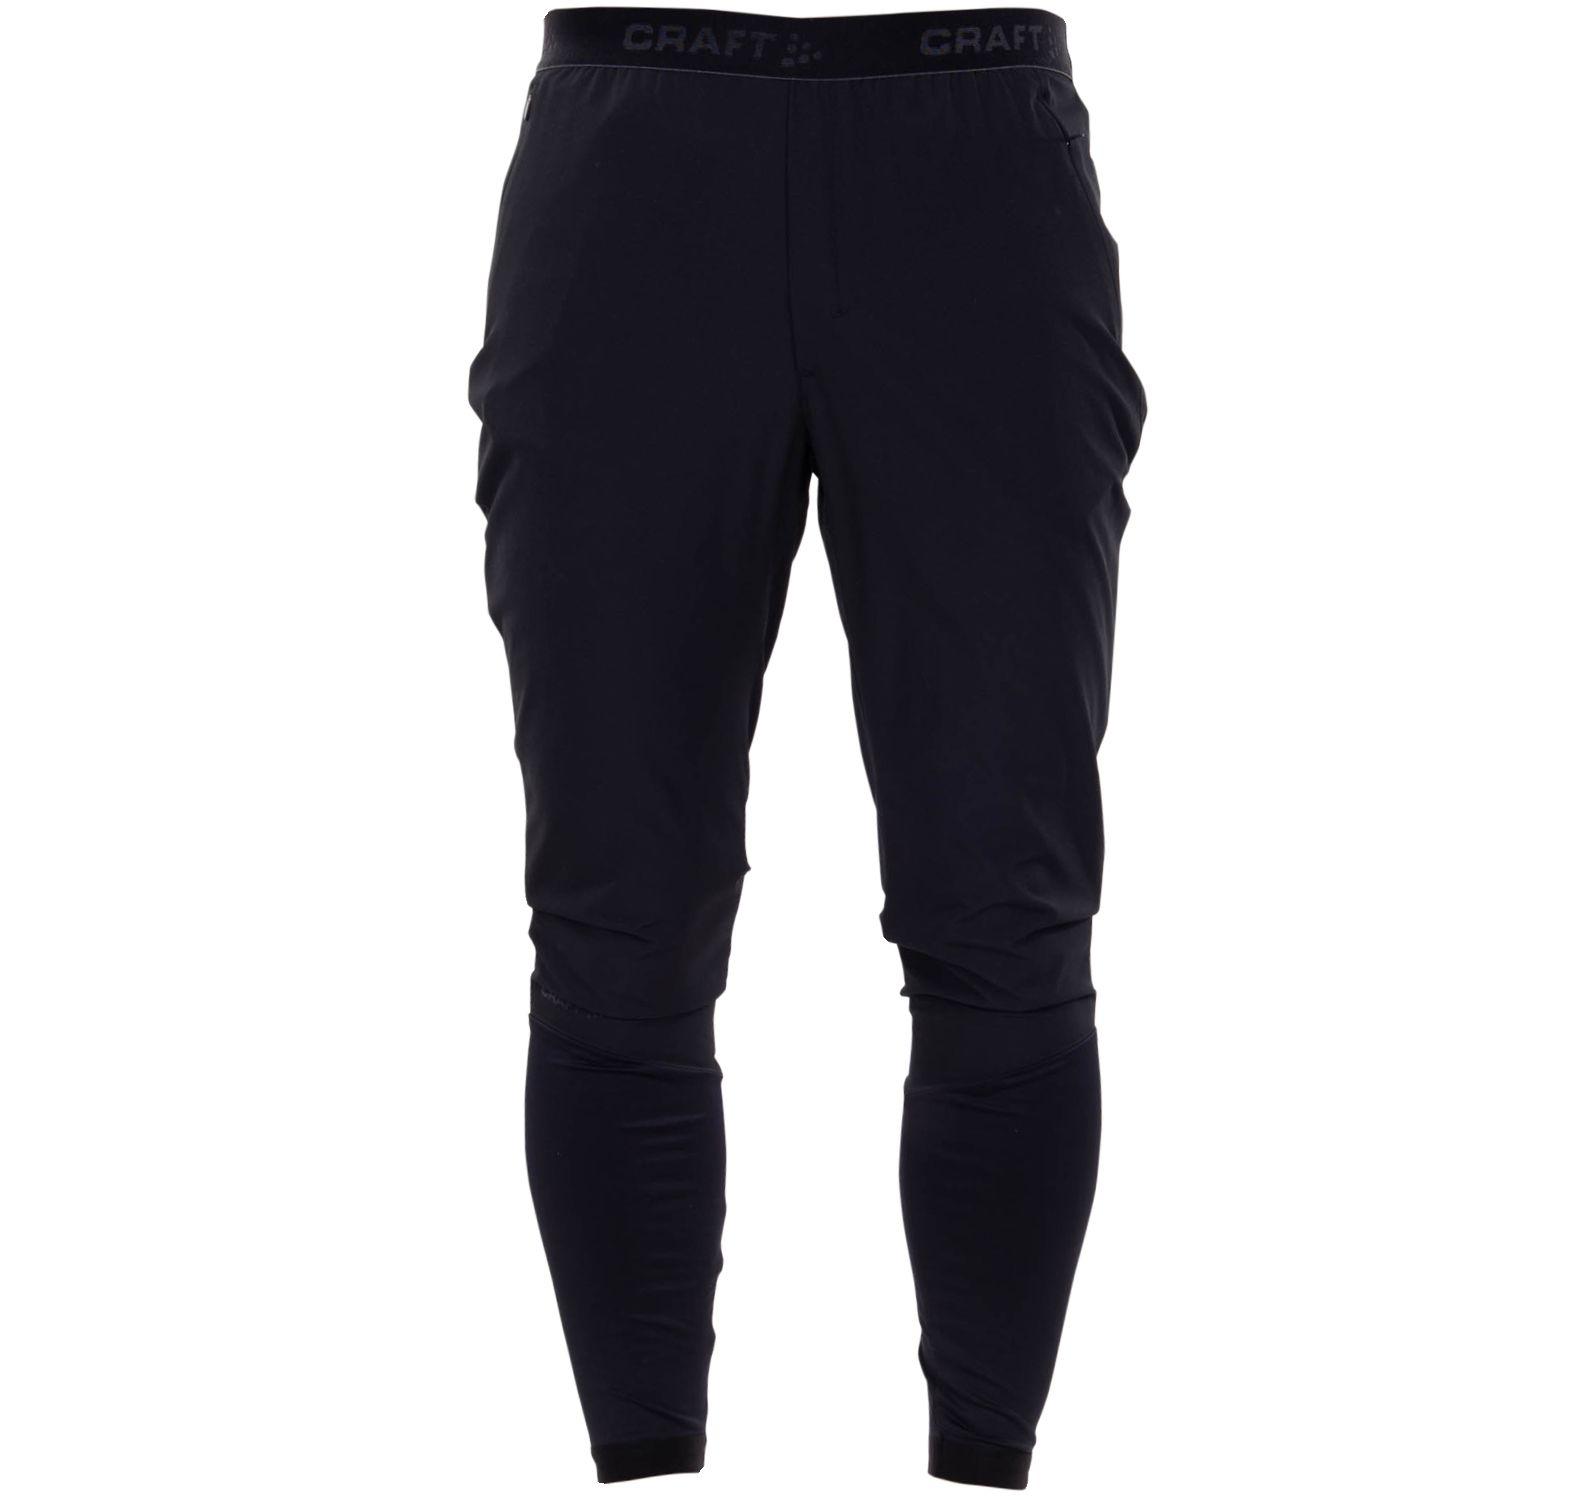 adv essence training pants m, black, l,  craft